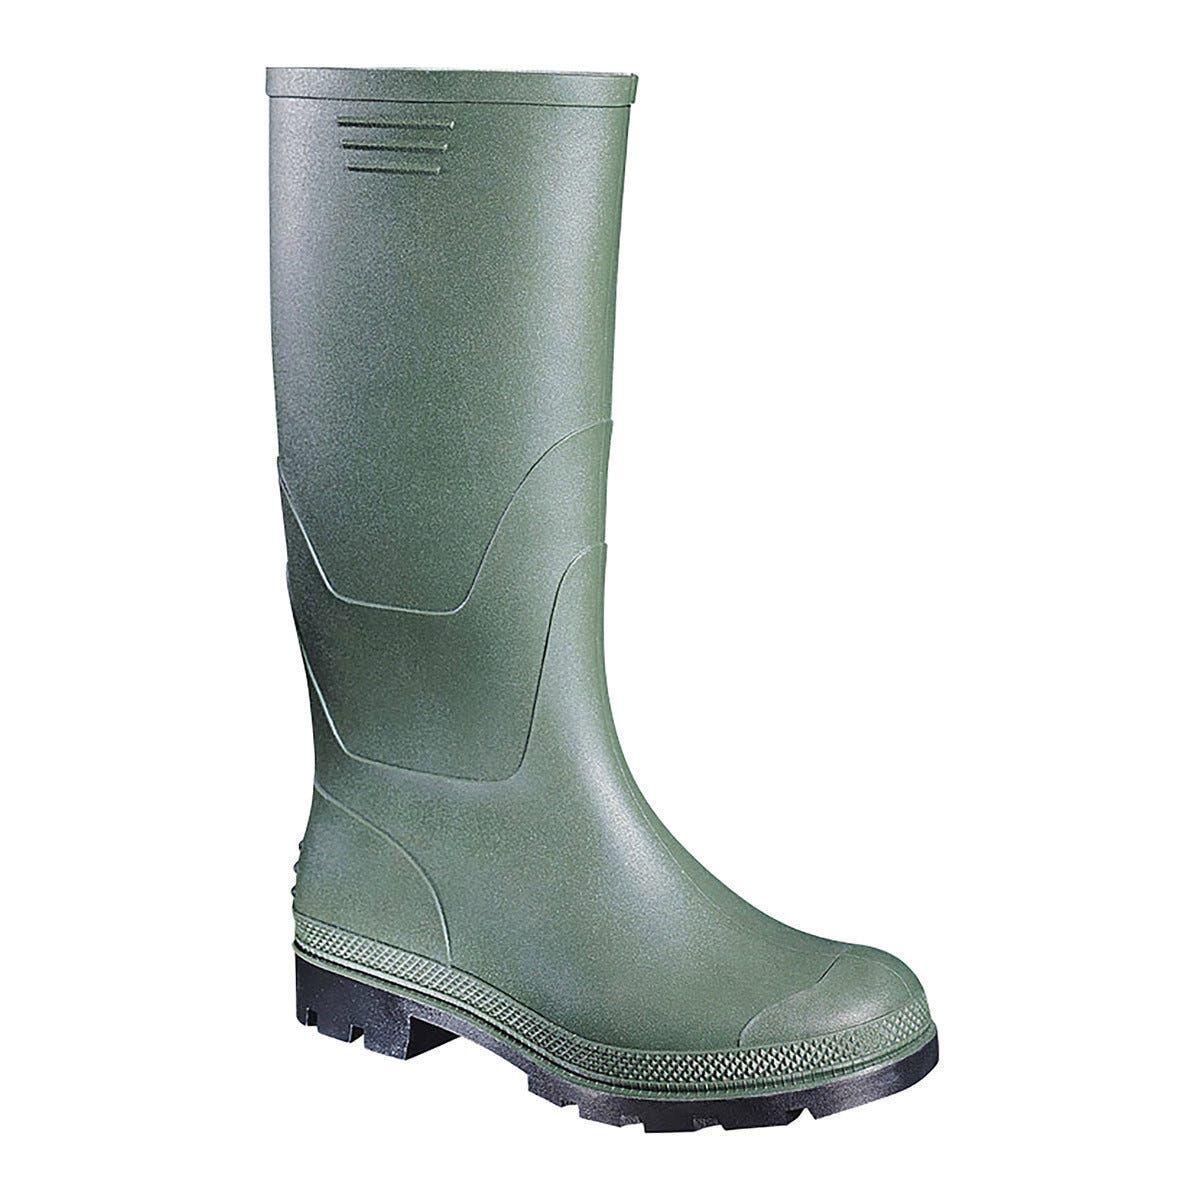 Stivale Ginocchio Pvc Misura 38 Boots Company